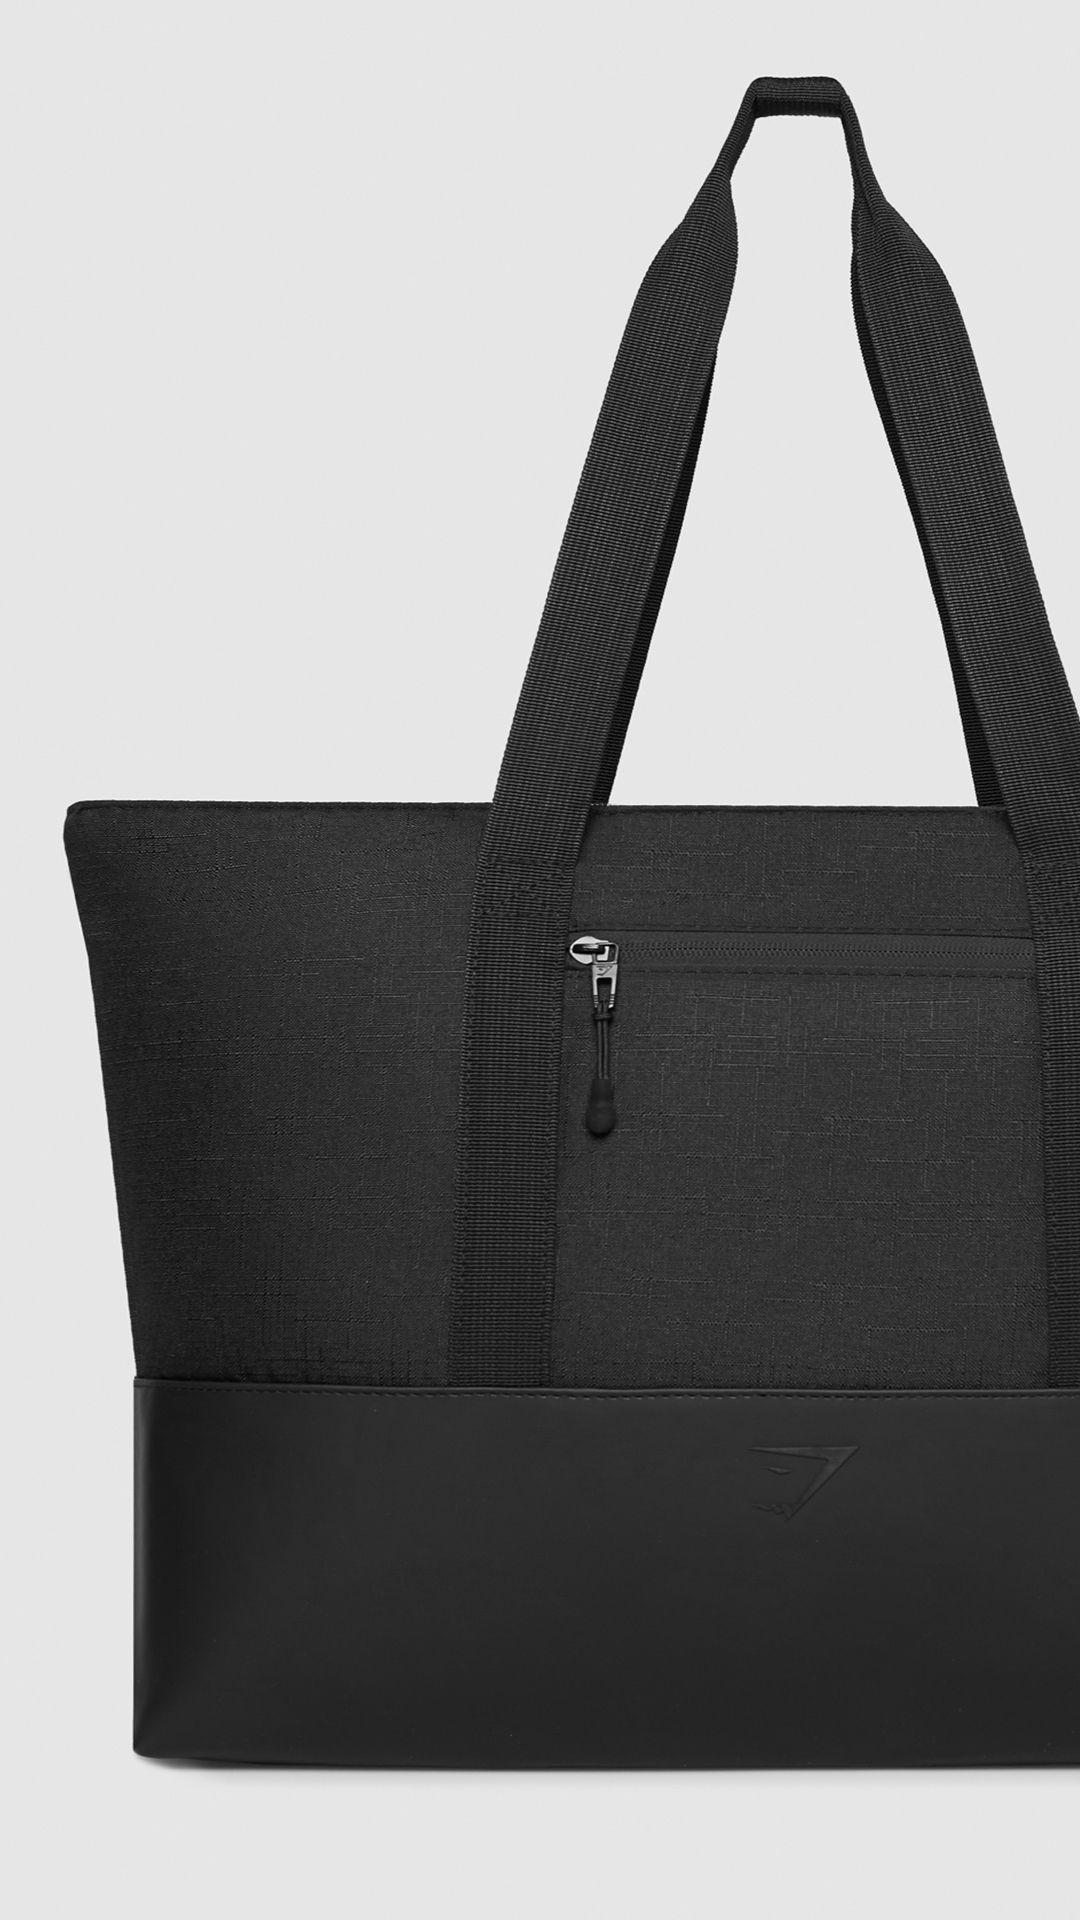 Gymshark Tote Bag - Black  9262f64ffb199